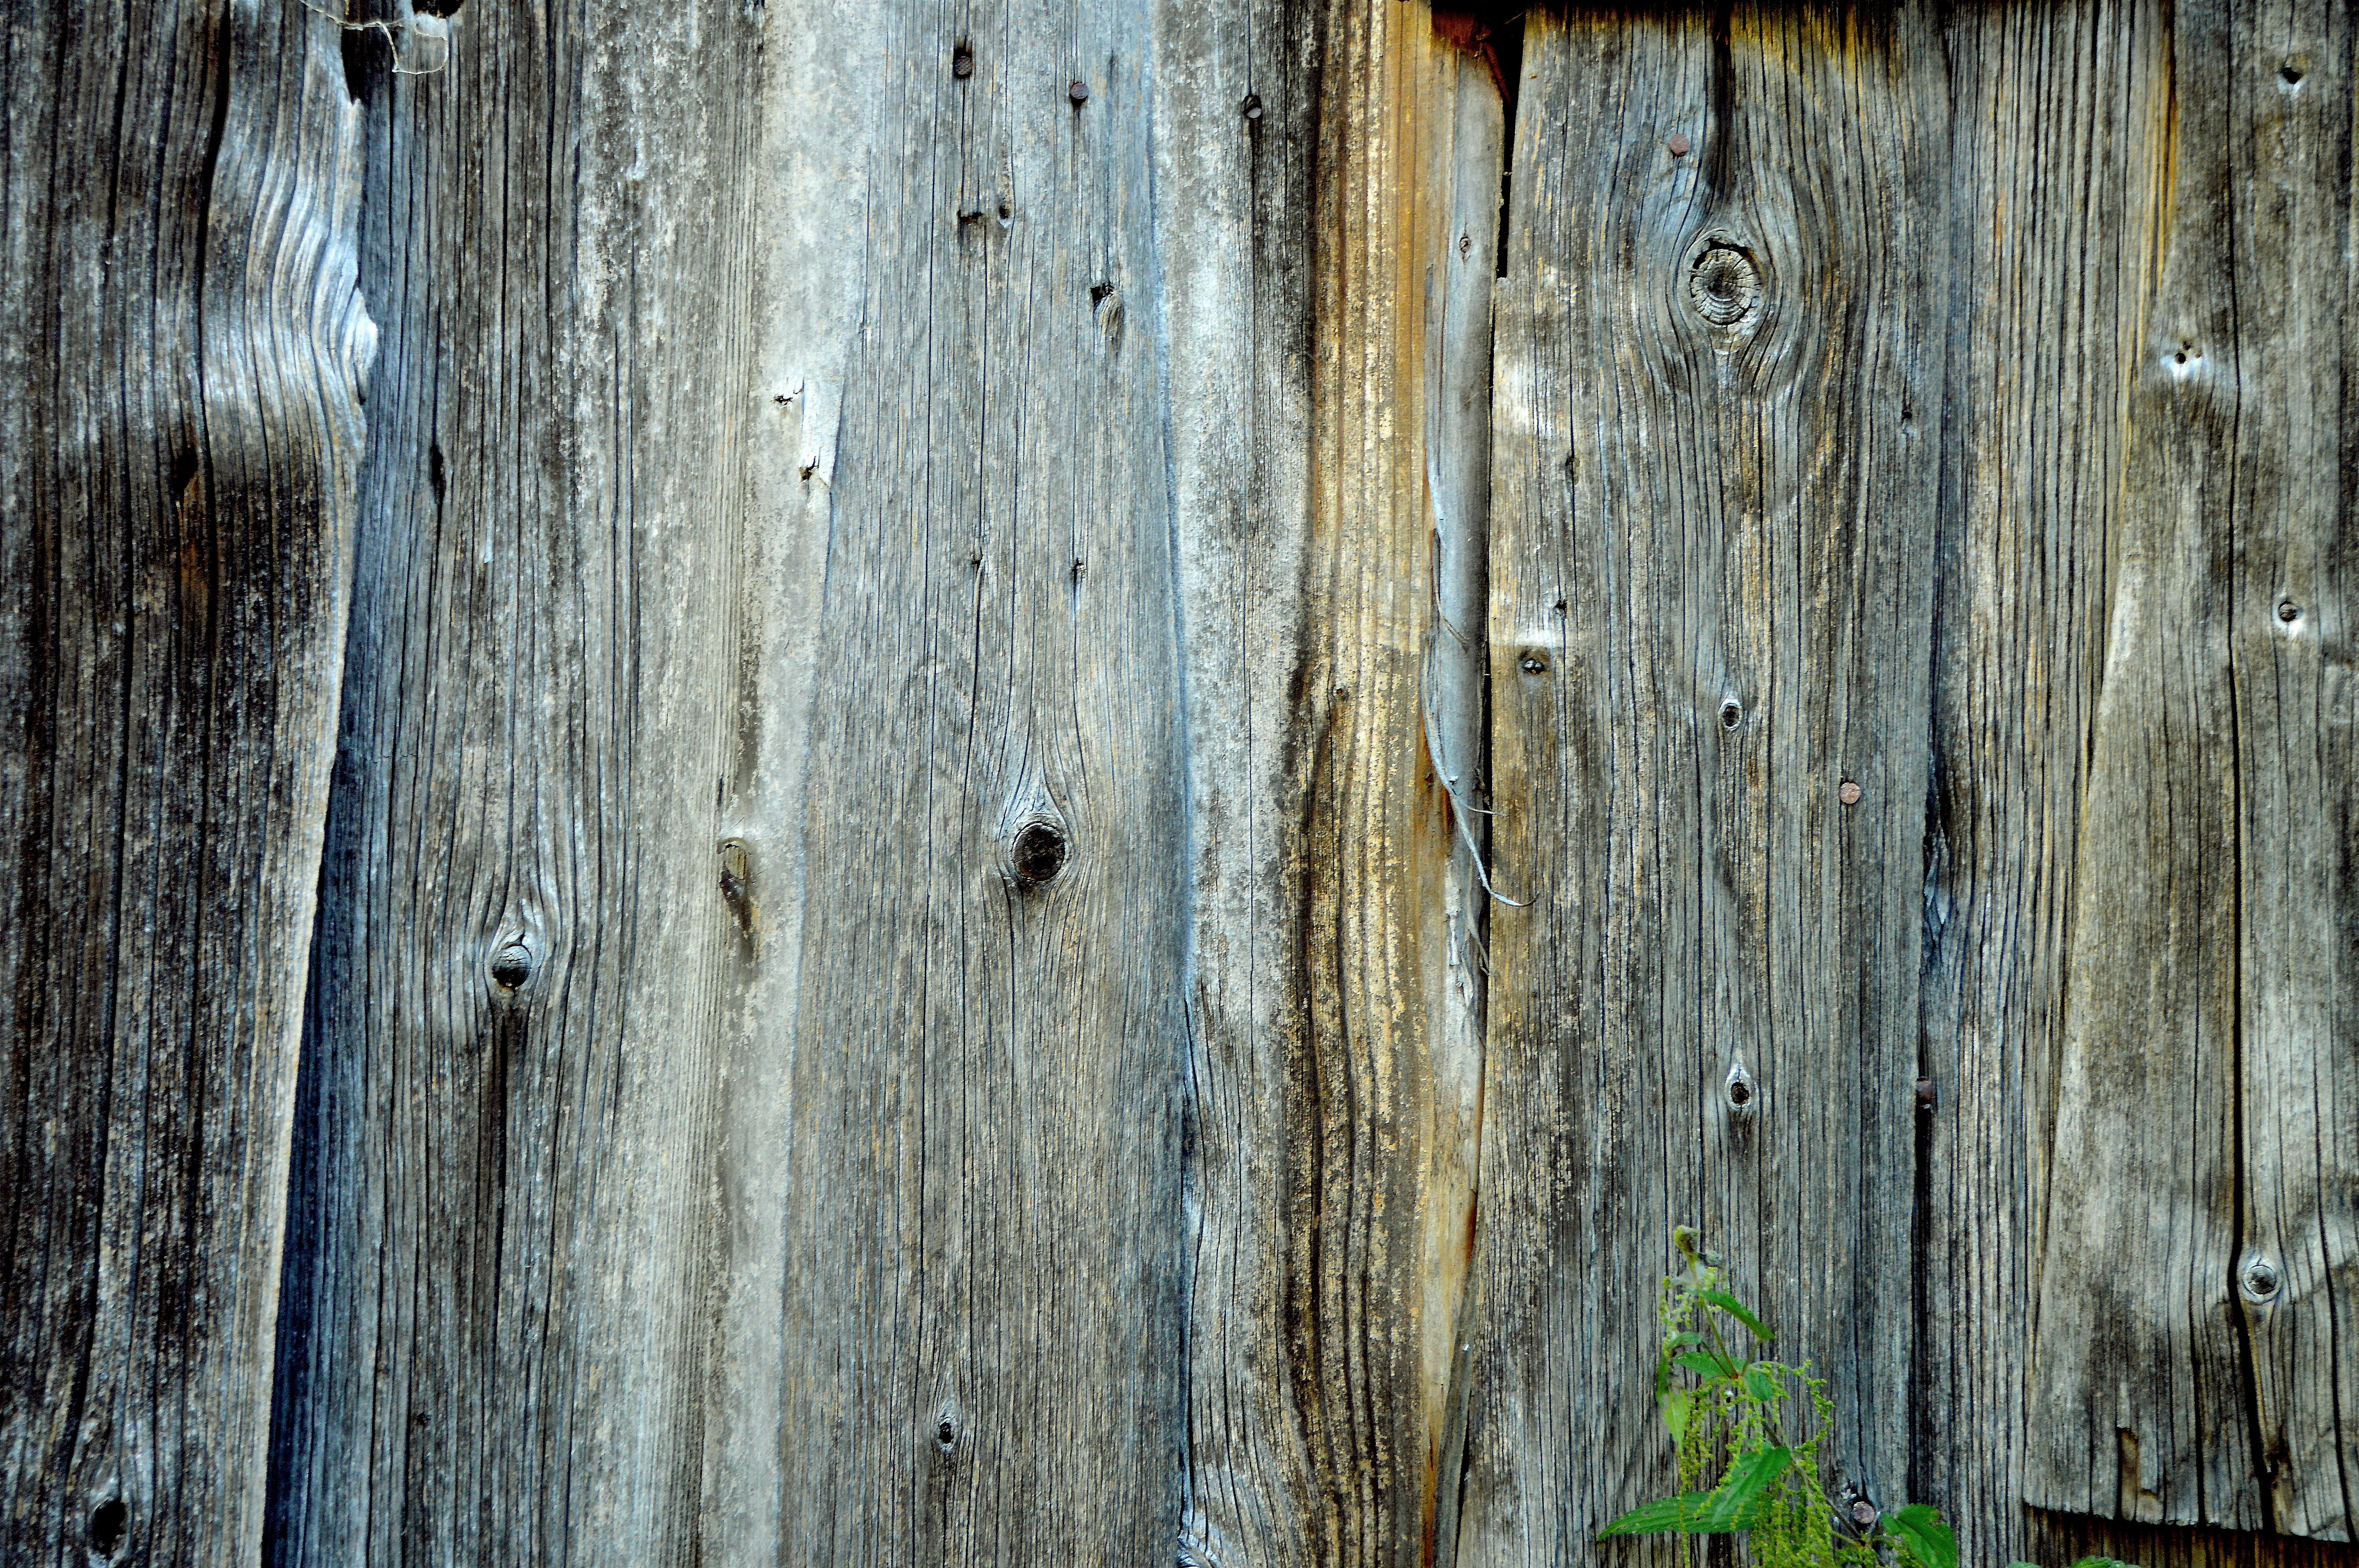 Kostenlose foto : Baum, Ast, Struktur, Tafel, Holz, Korn, Textur ...